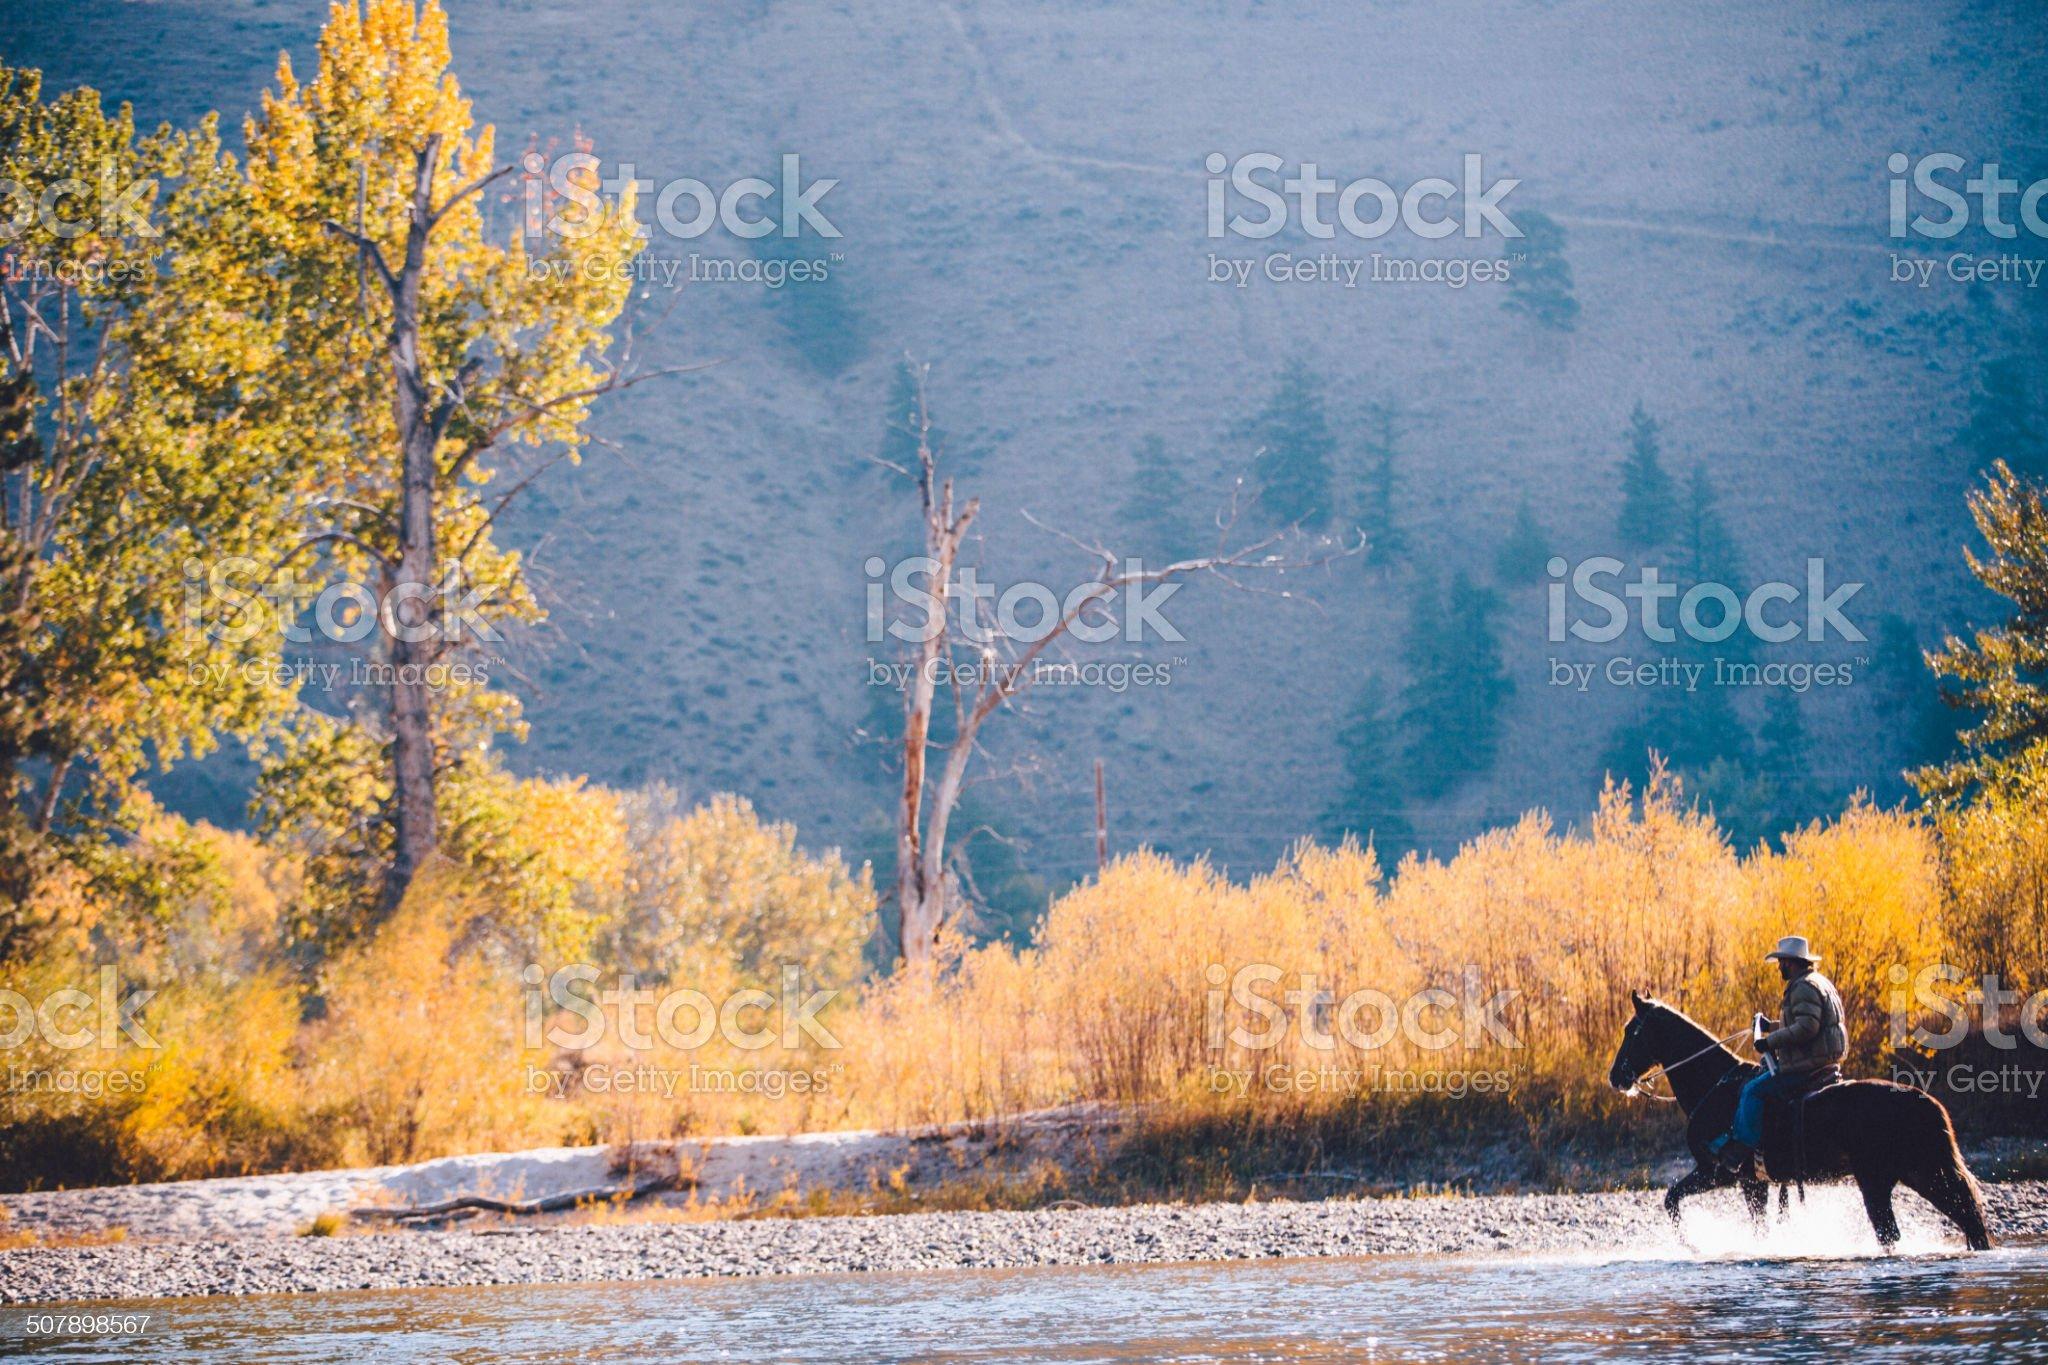 Cowboy riding horse along riverbank splashes through water royalty-free stock photo